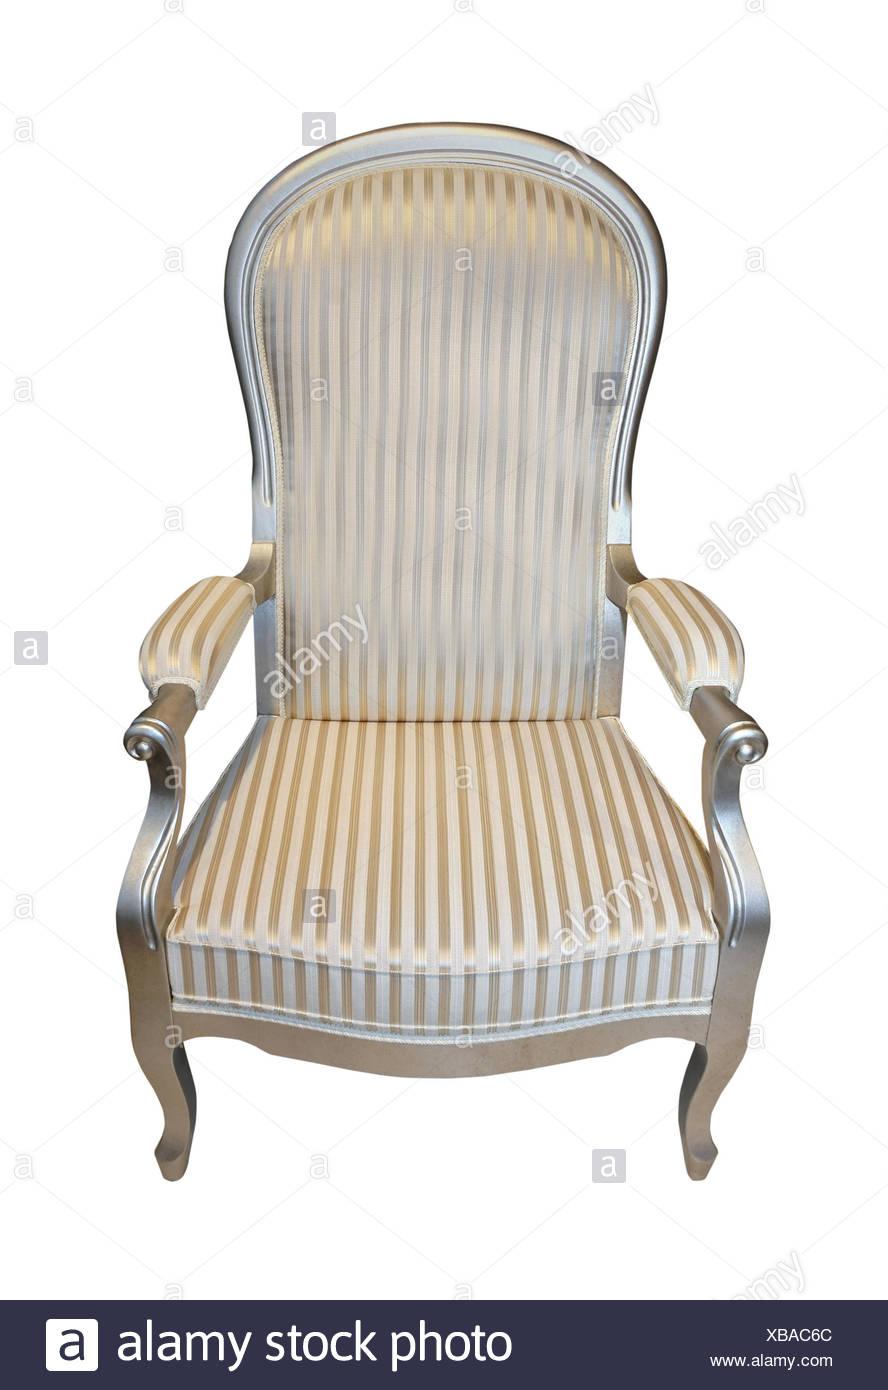 Sessel Isoliert Holz Antik Silber Vintage Sitz Retro Aus